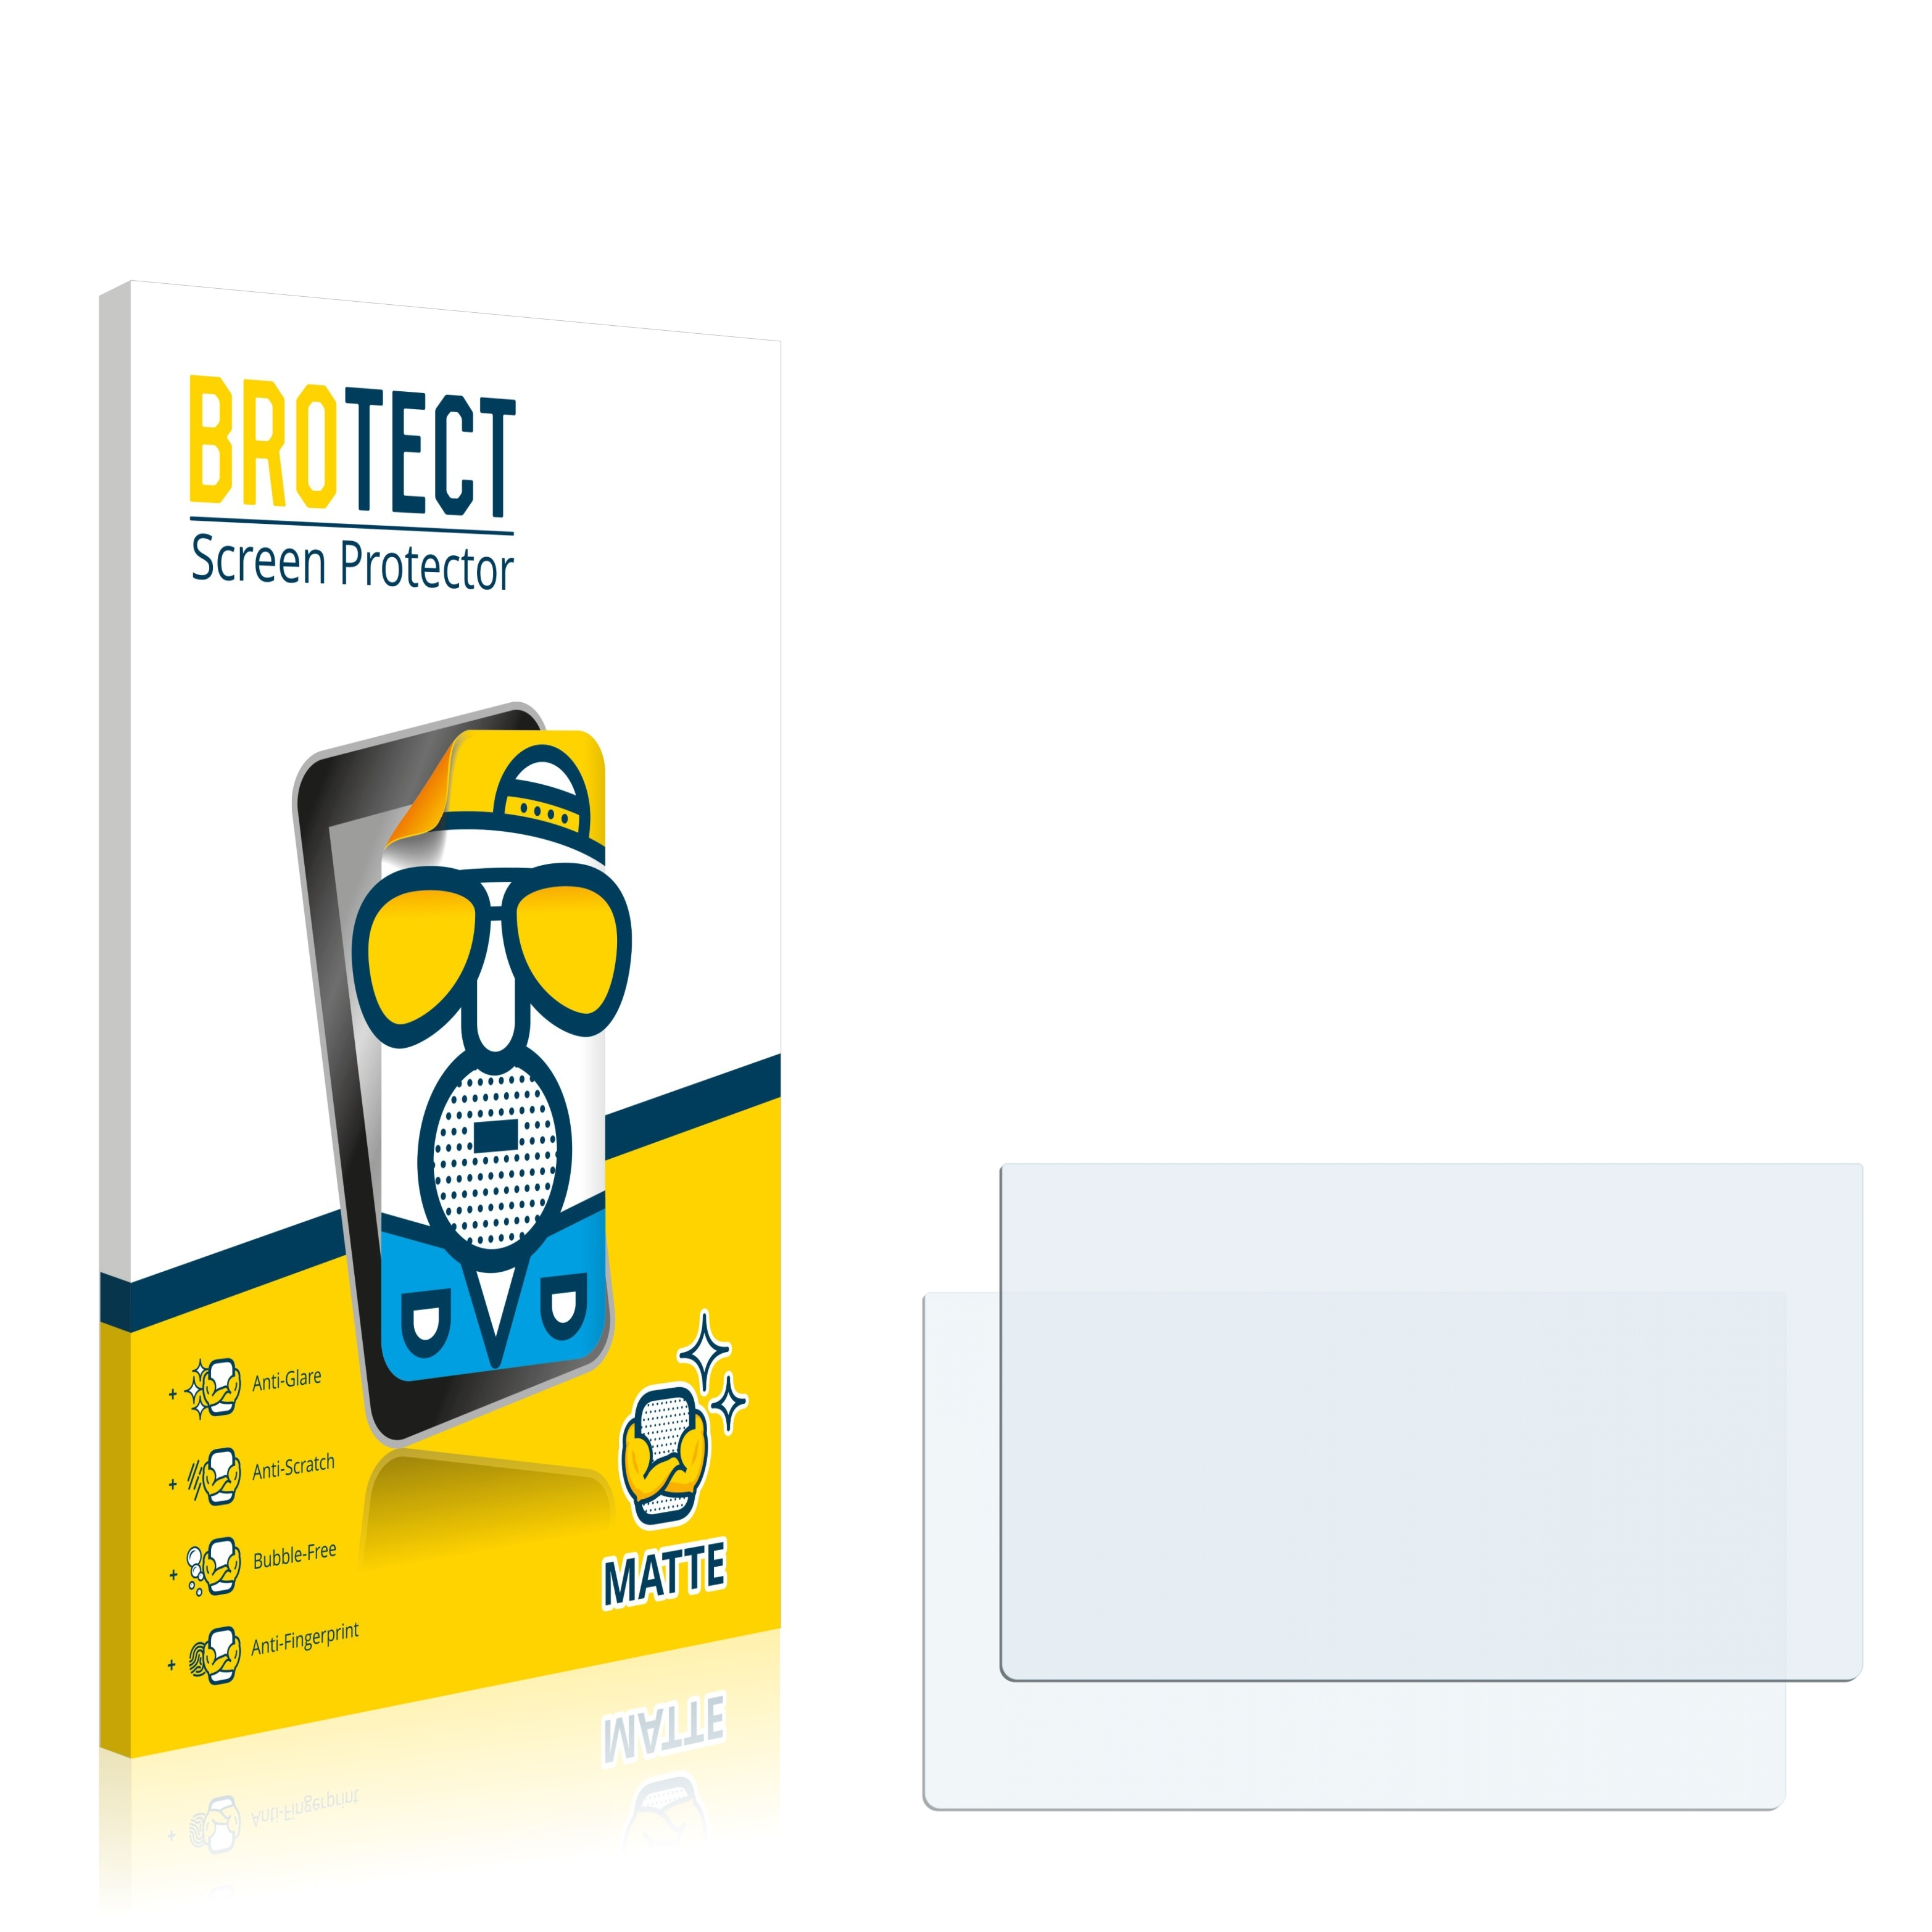 Upscreen reflection película protectora Opel Navi 900 intellilink 8.0 Mokka Matt